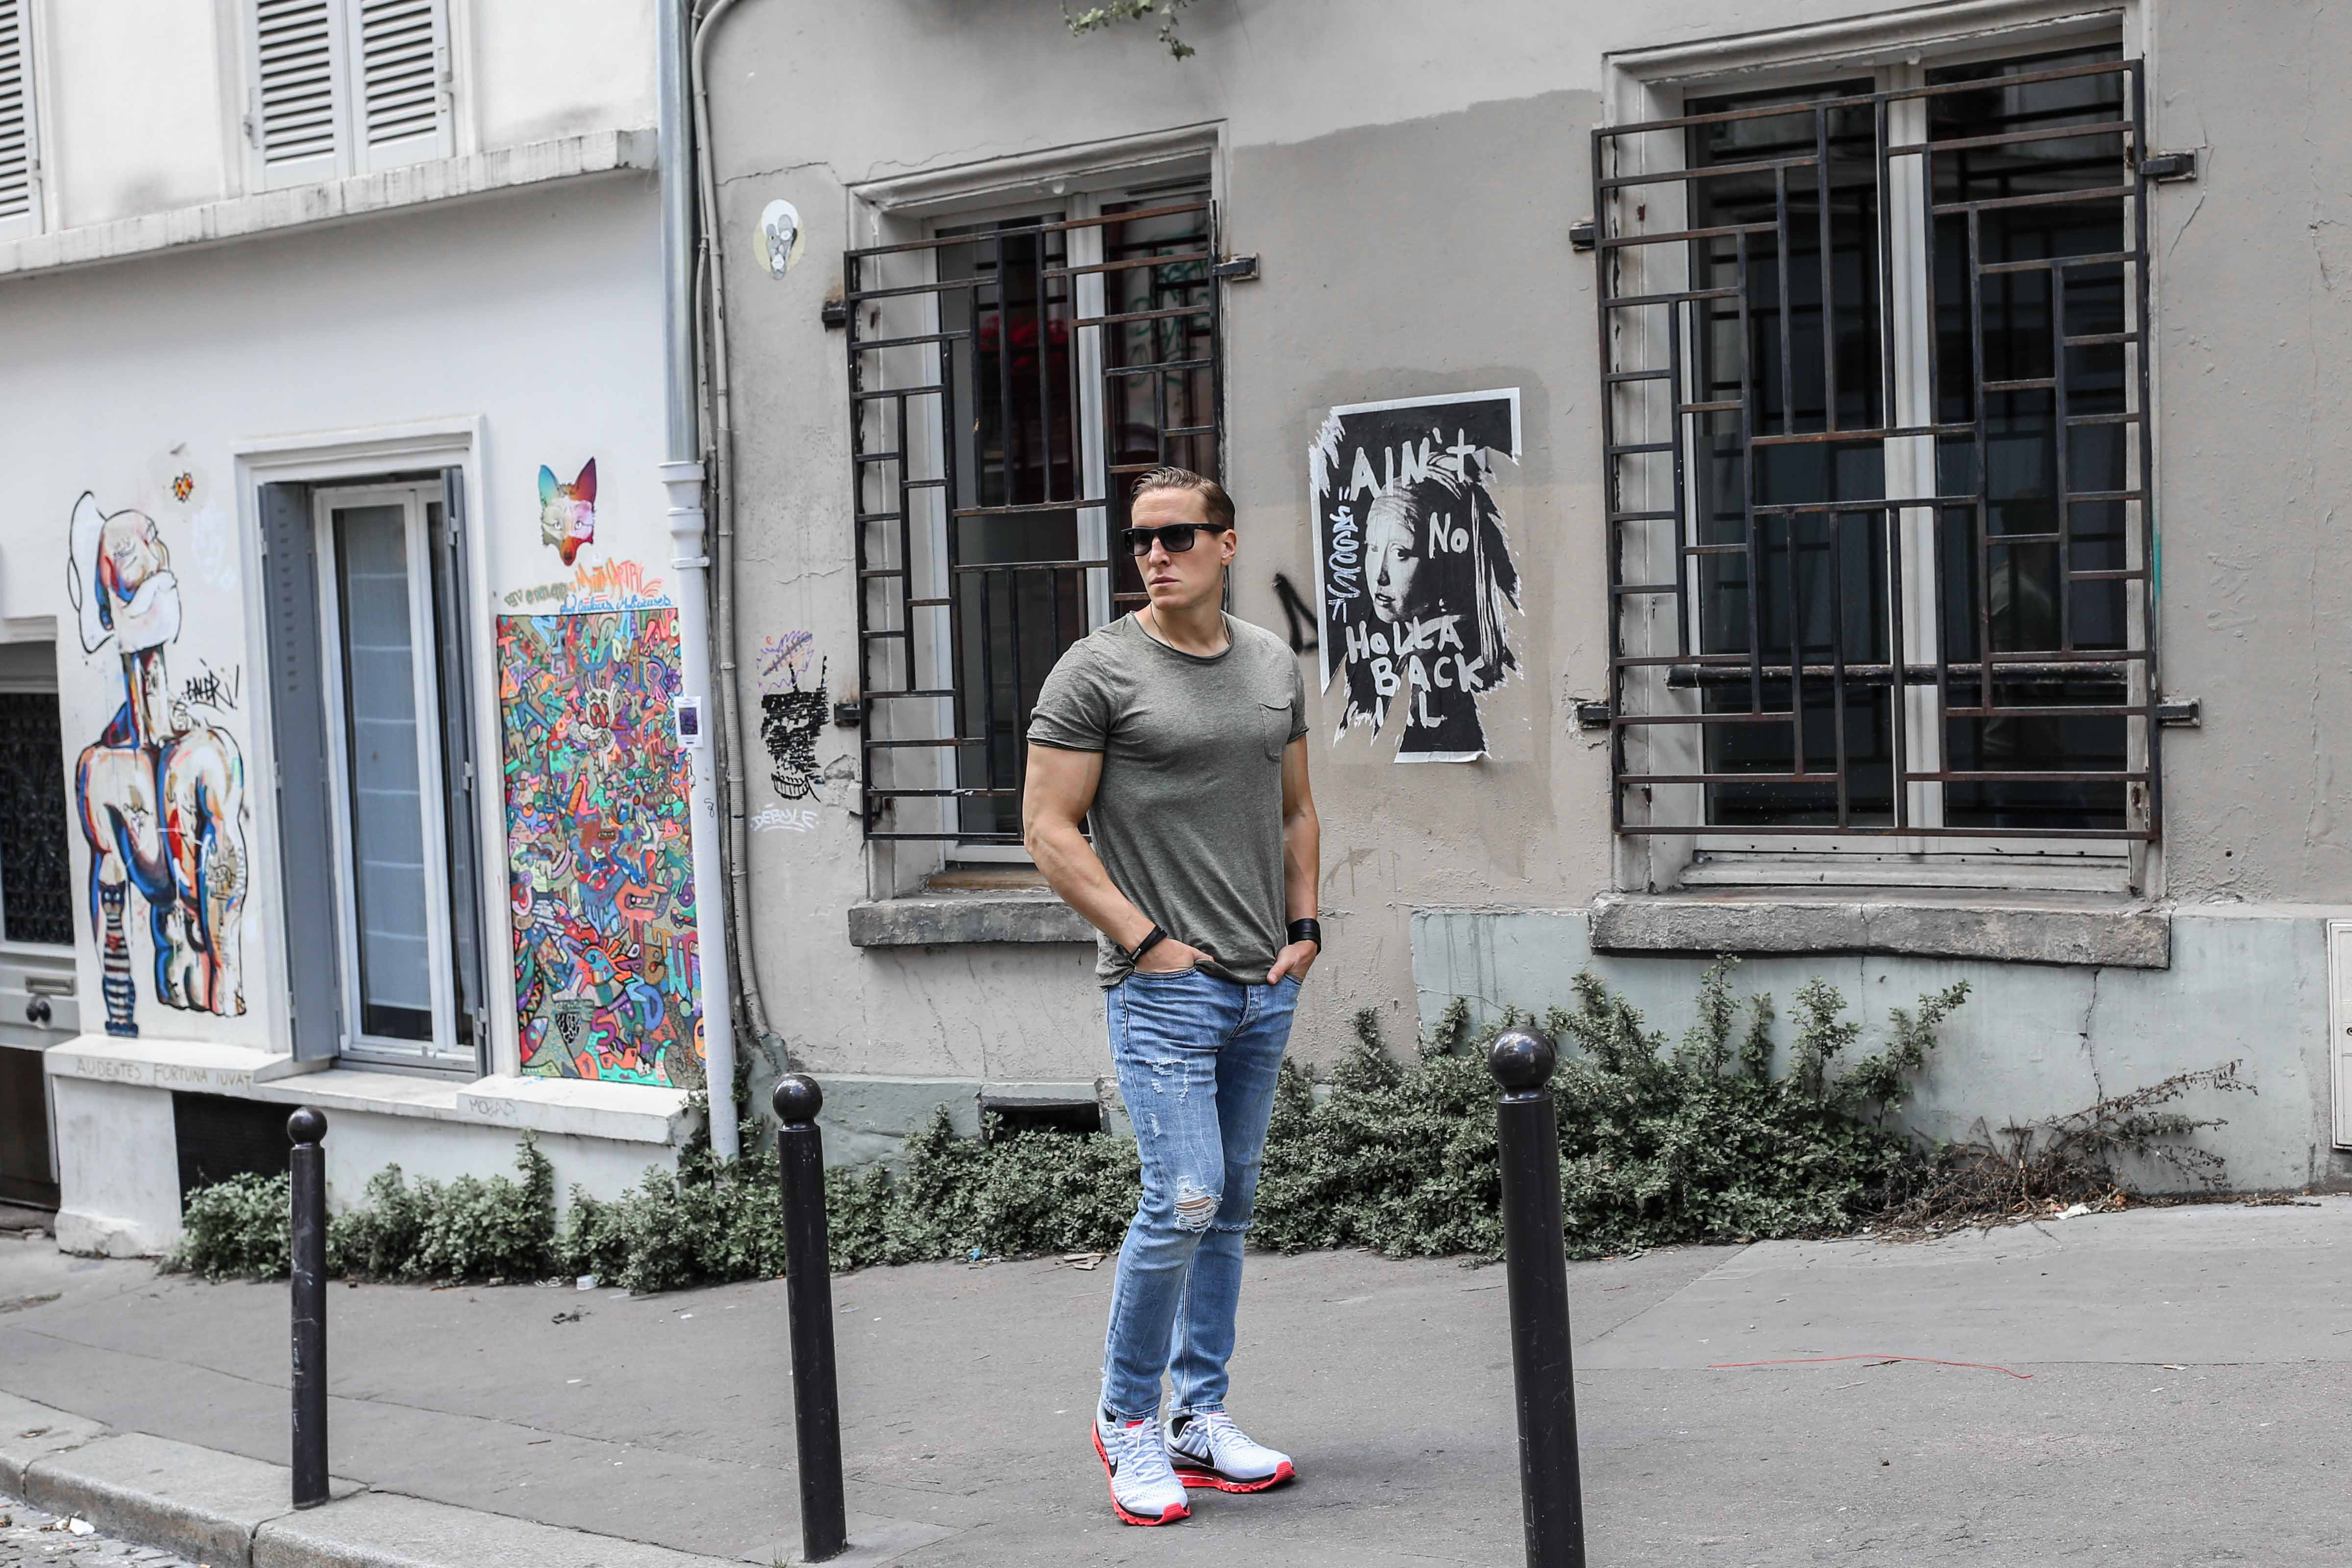 männerblog-modeblog-outfit-paris-basic-look-grünes-tshirt-ripped-jeans-nike-air-max-2017_2298